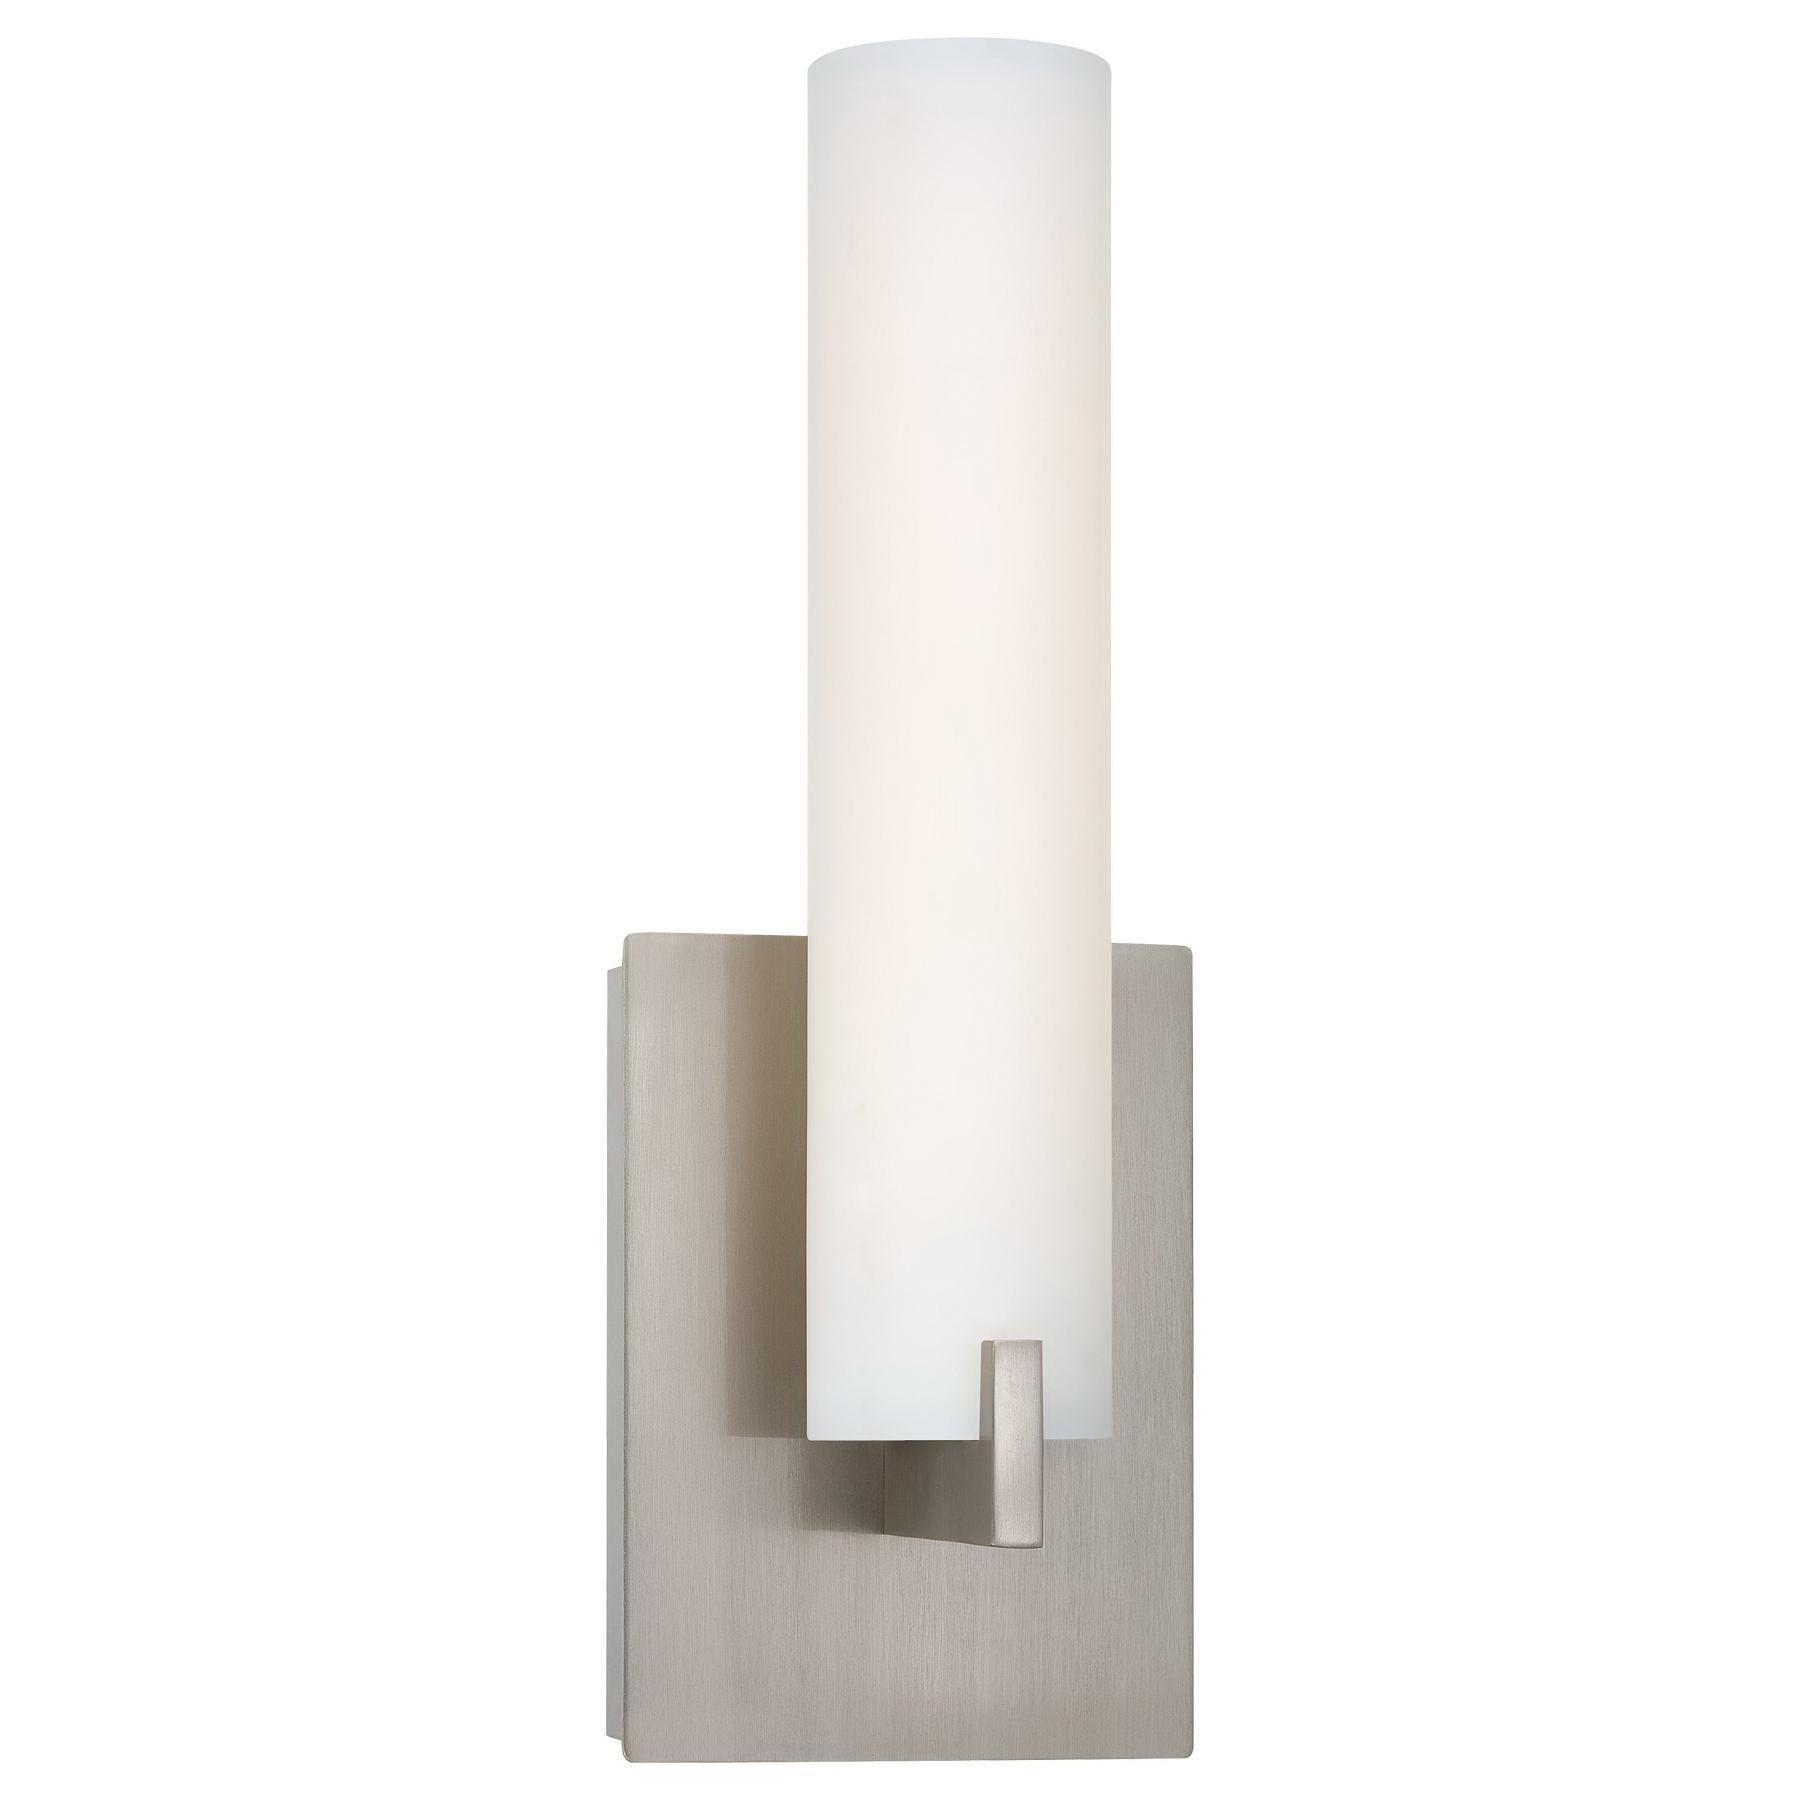 Minka Lighting P5040 084 L 1 Light Led Wall Sconce 10 Watt